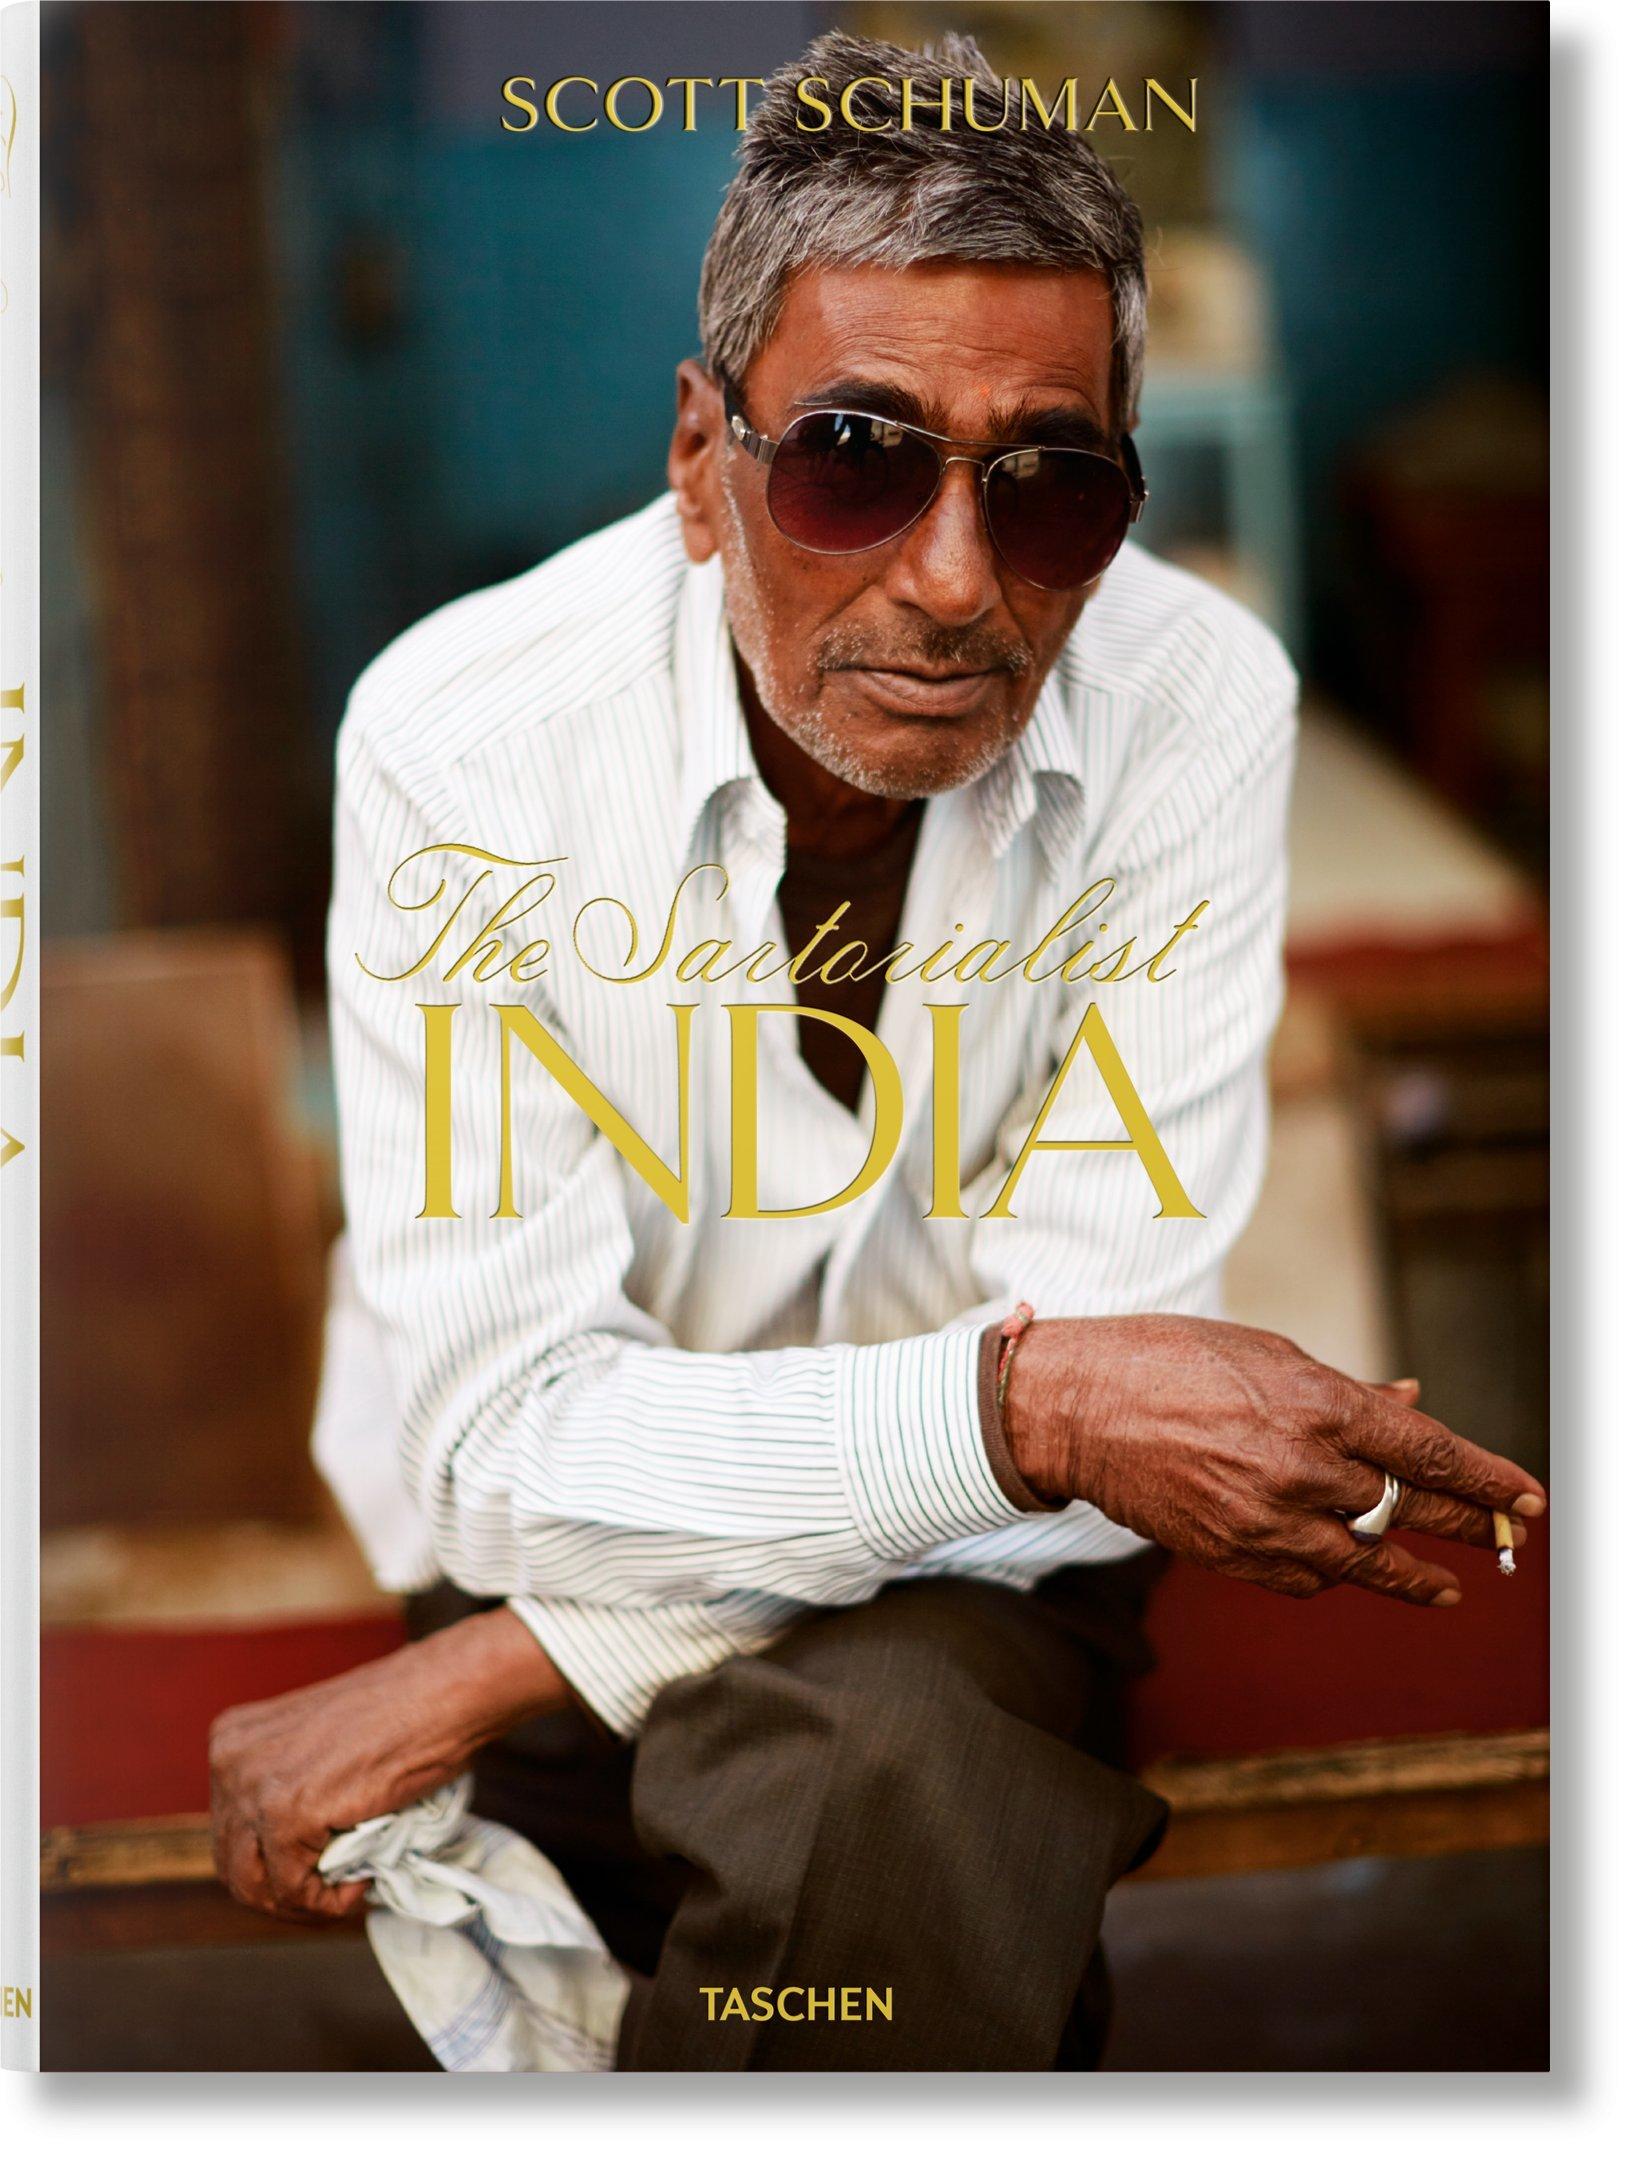 fo-the_sartorialist_india-cover_05353